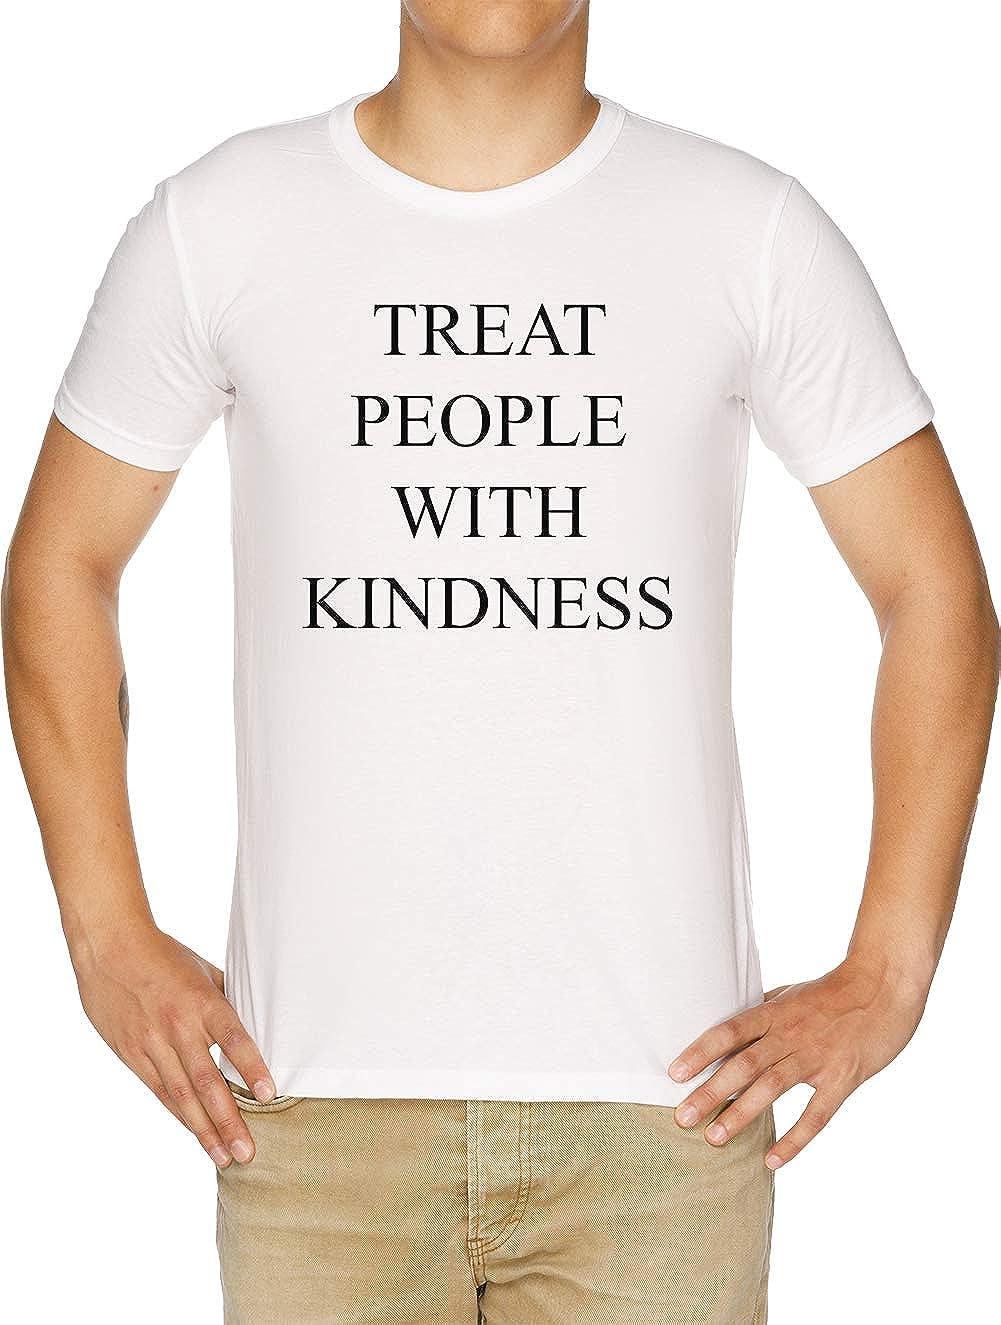 Treat People with Kindness Camiseta Hombre Blanco: Amazon.es ...